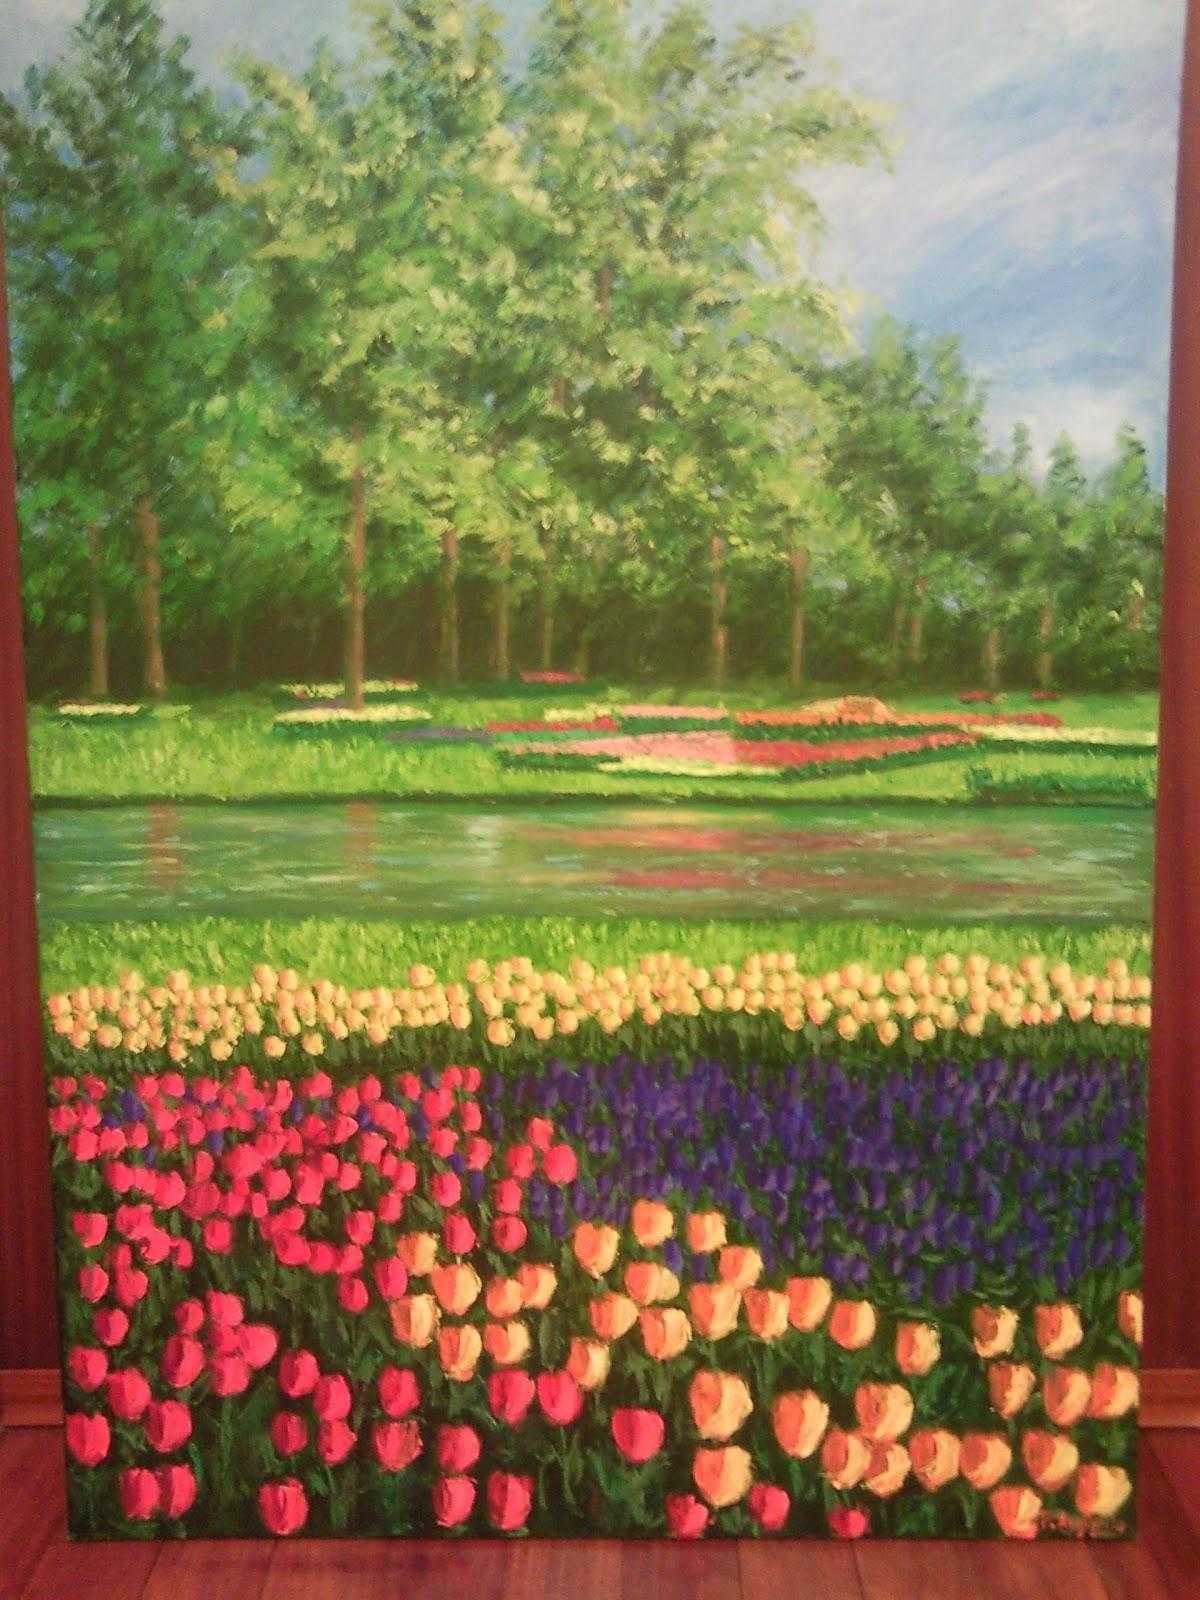 Jardin de tulipanes holanda arte arguello arco iris - Jardines de tulipanes en holanda ...